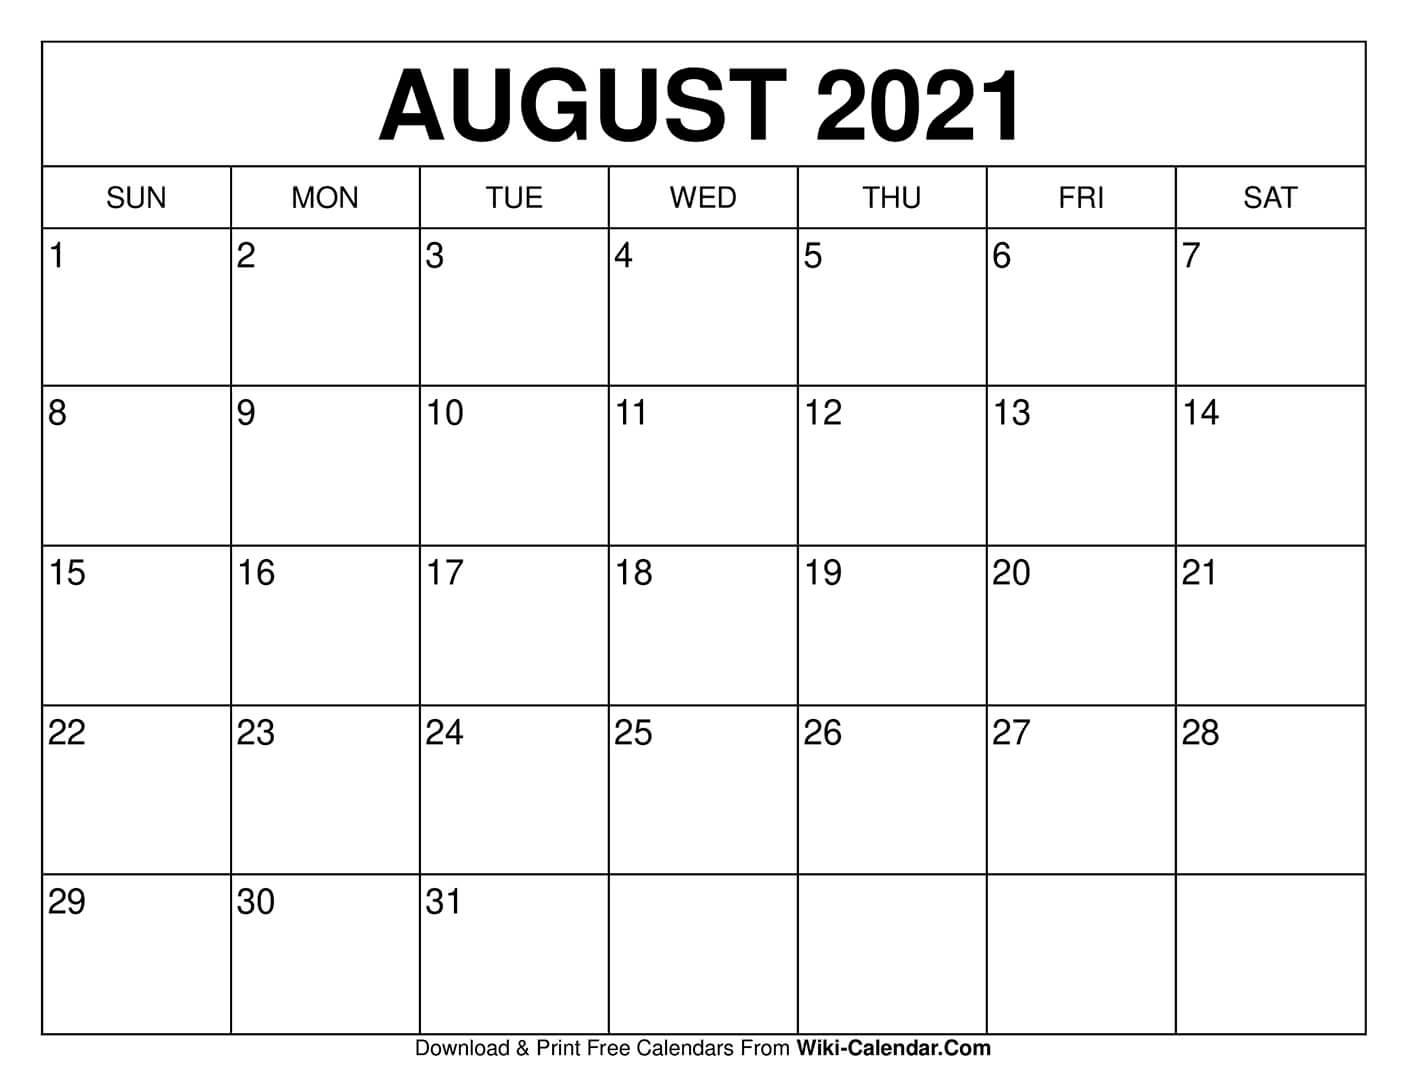 Get Calendar August 2021 Printable